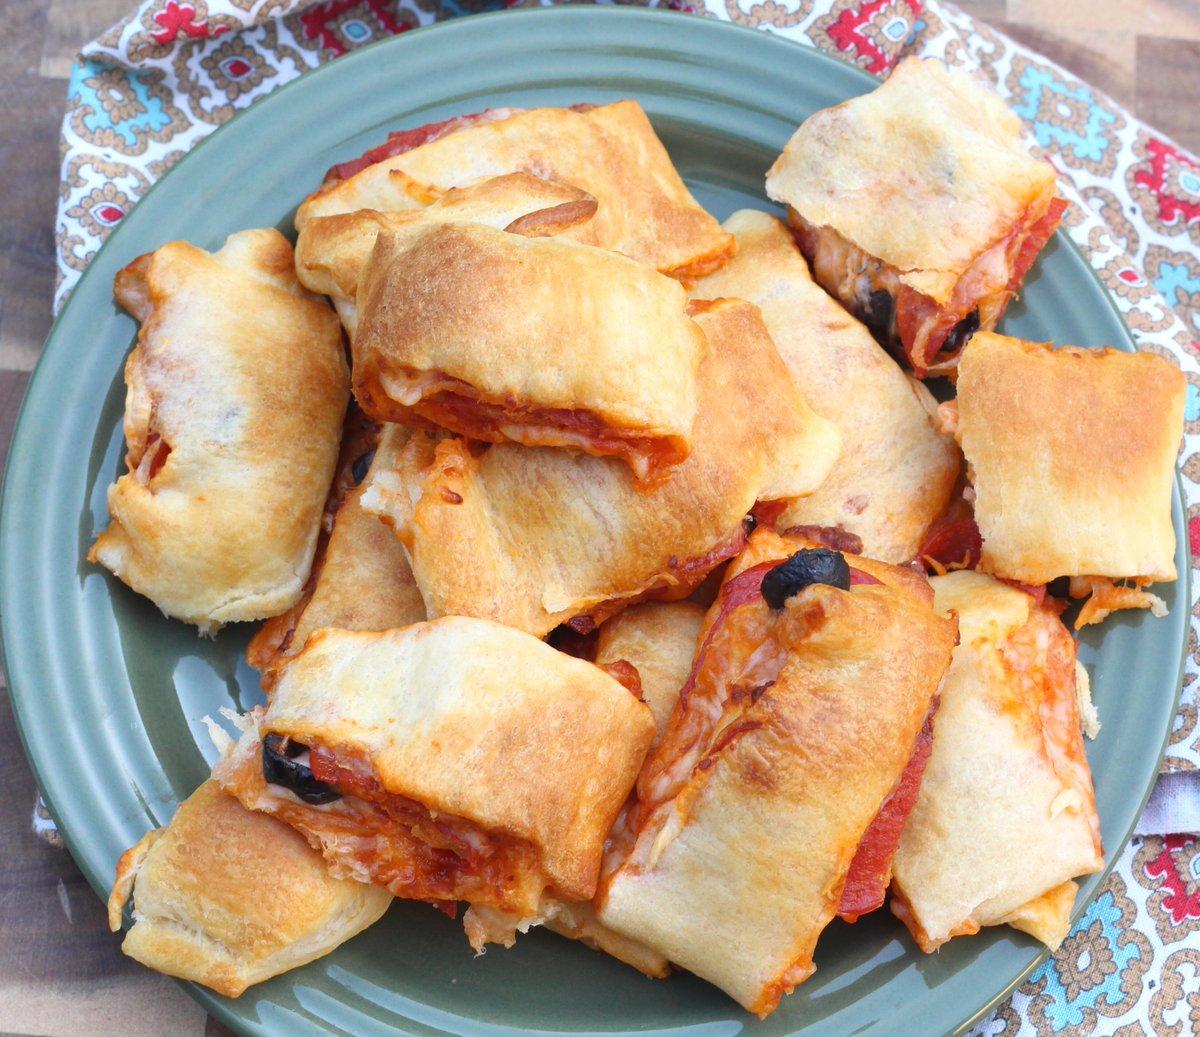 Air Fryer Pizza Rolls - Less Bread, More Filling in Each Bite!    #airfryer #pizzarolls #pizza #whatsfordinner #easydinnerrecipe #mondaymotivation